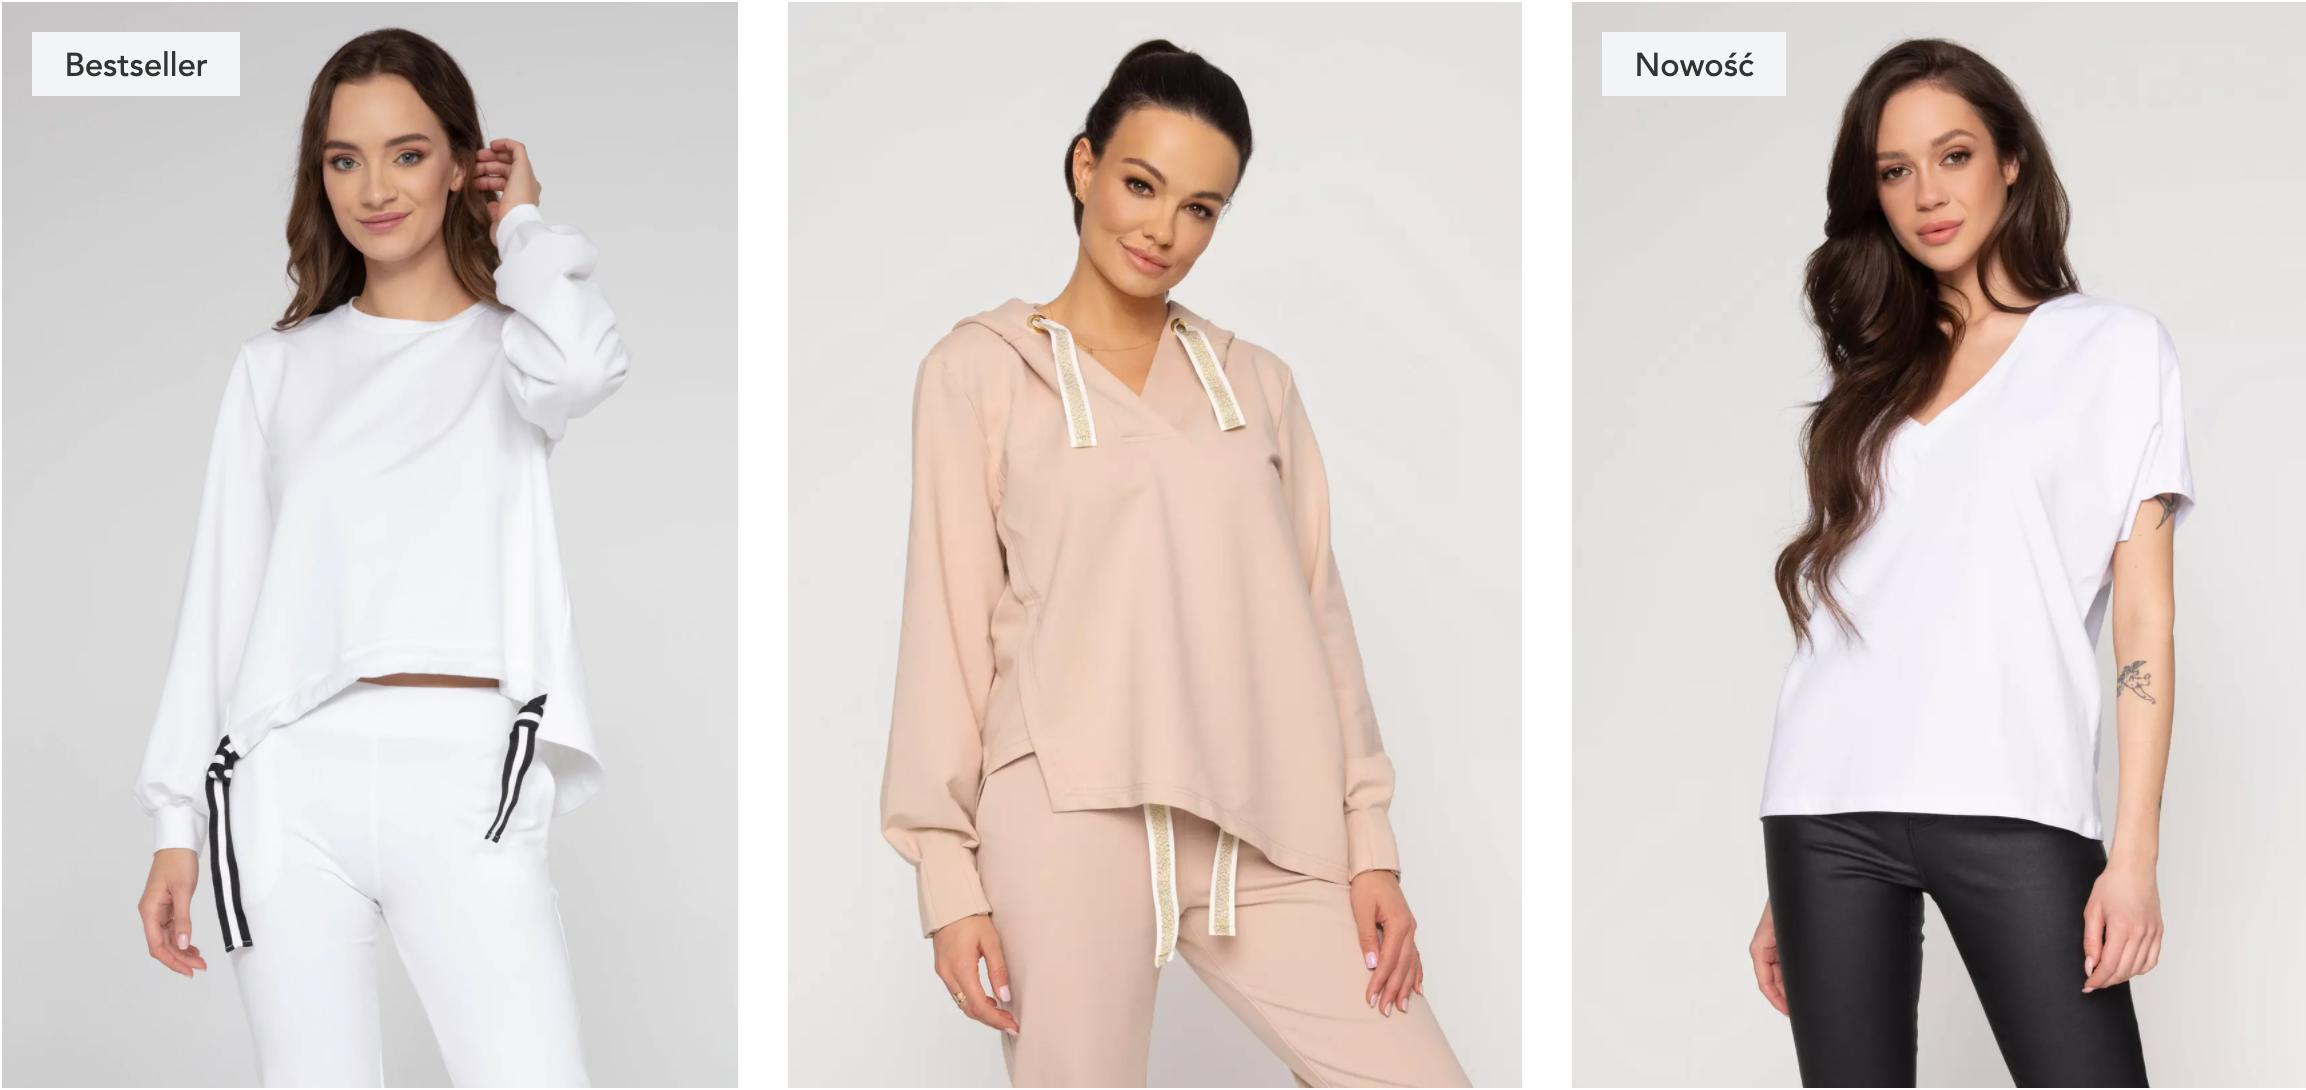 Gatta: homewear - wygodne ubrania domowe